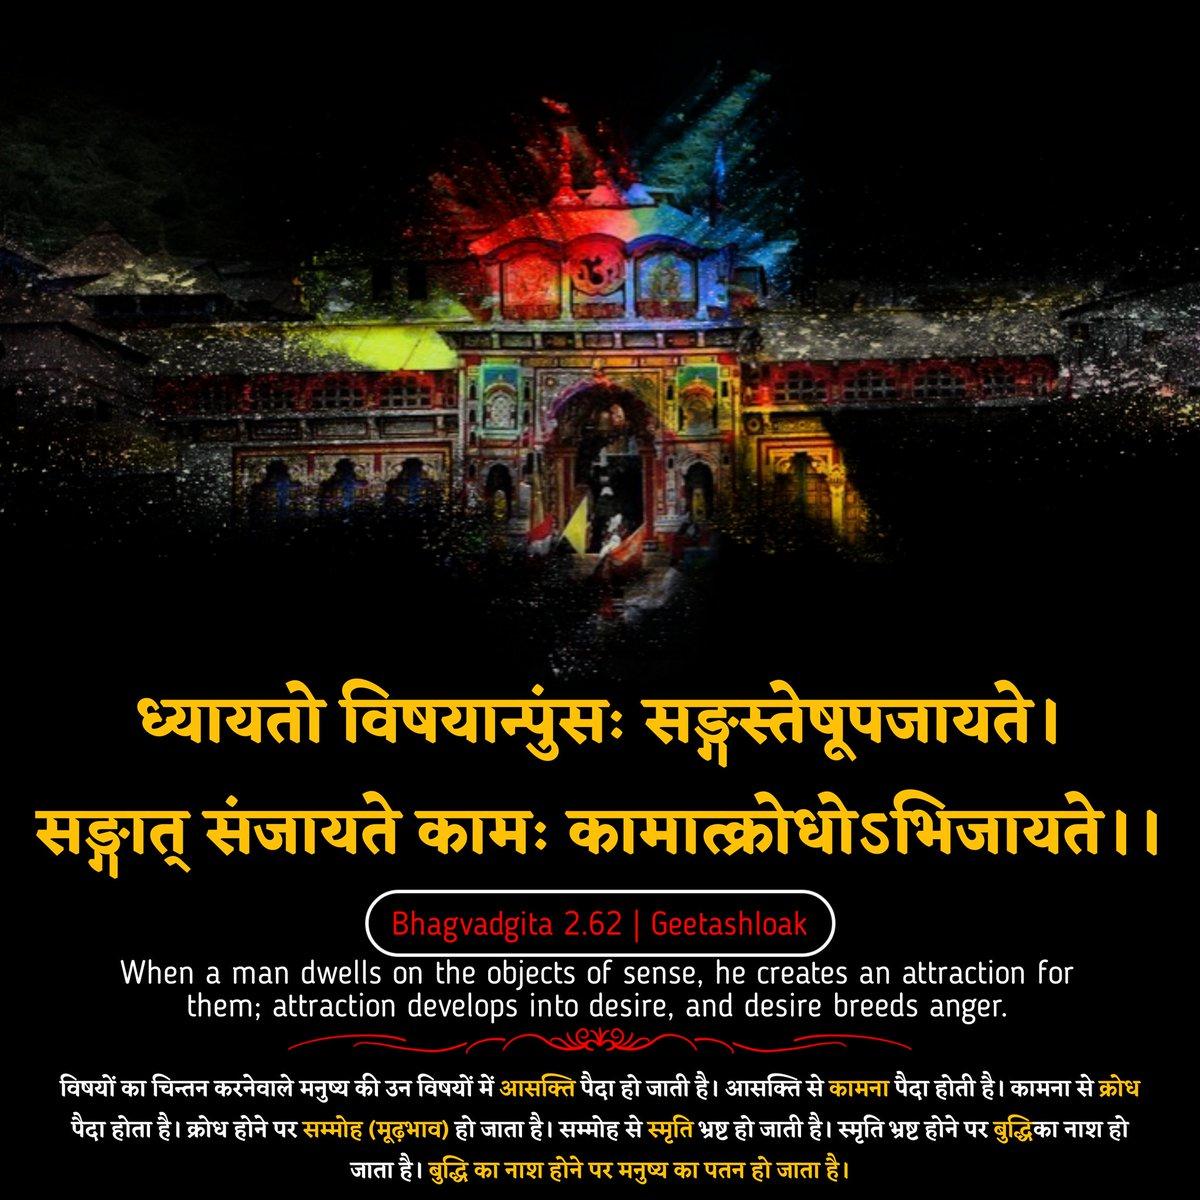 श्रीमद्भगवद्गीता अध्याय 2श्लोक 62 Bhagvad Gita Chapter 2 Verse 62  Follow @geetashloak Like and turn on notifications for more shloaks.  #geetashlok #gitaupdesh #follow #notifications  #badrinathtemple #uttarakhand #kedarnathtemple #badrinath_kedarnath_gangotari_yamnotari https://t.co/xMfu49lRWv